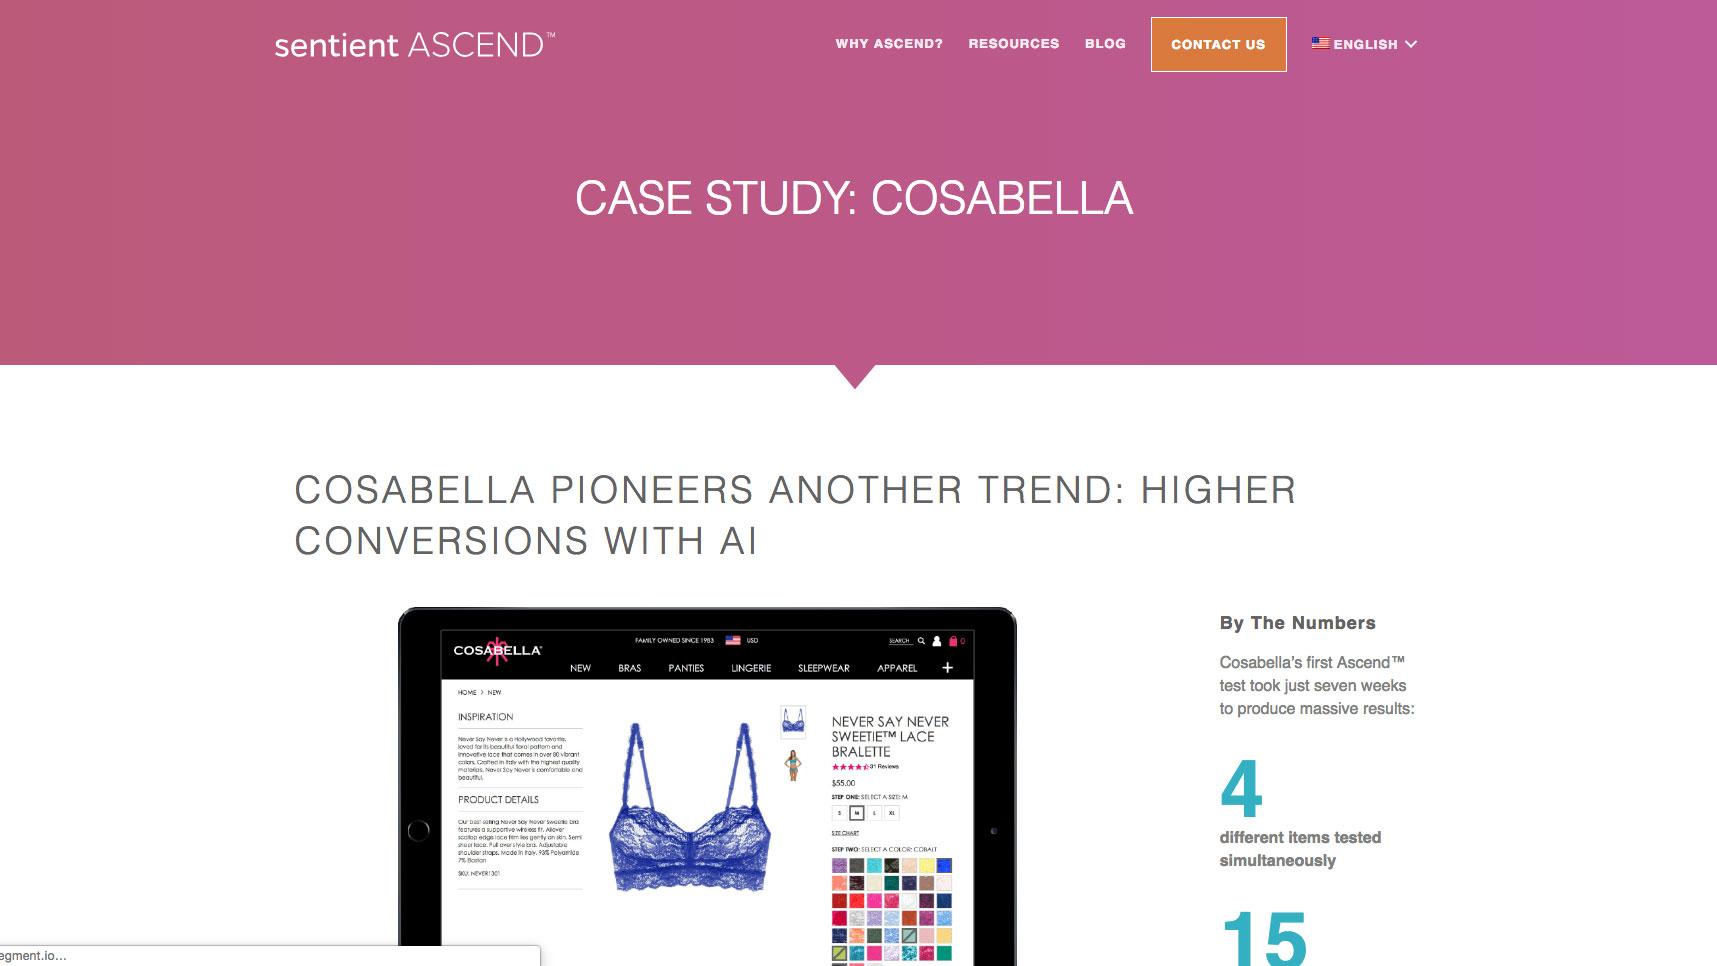 Cosabella case study landing page